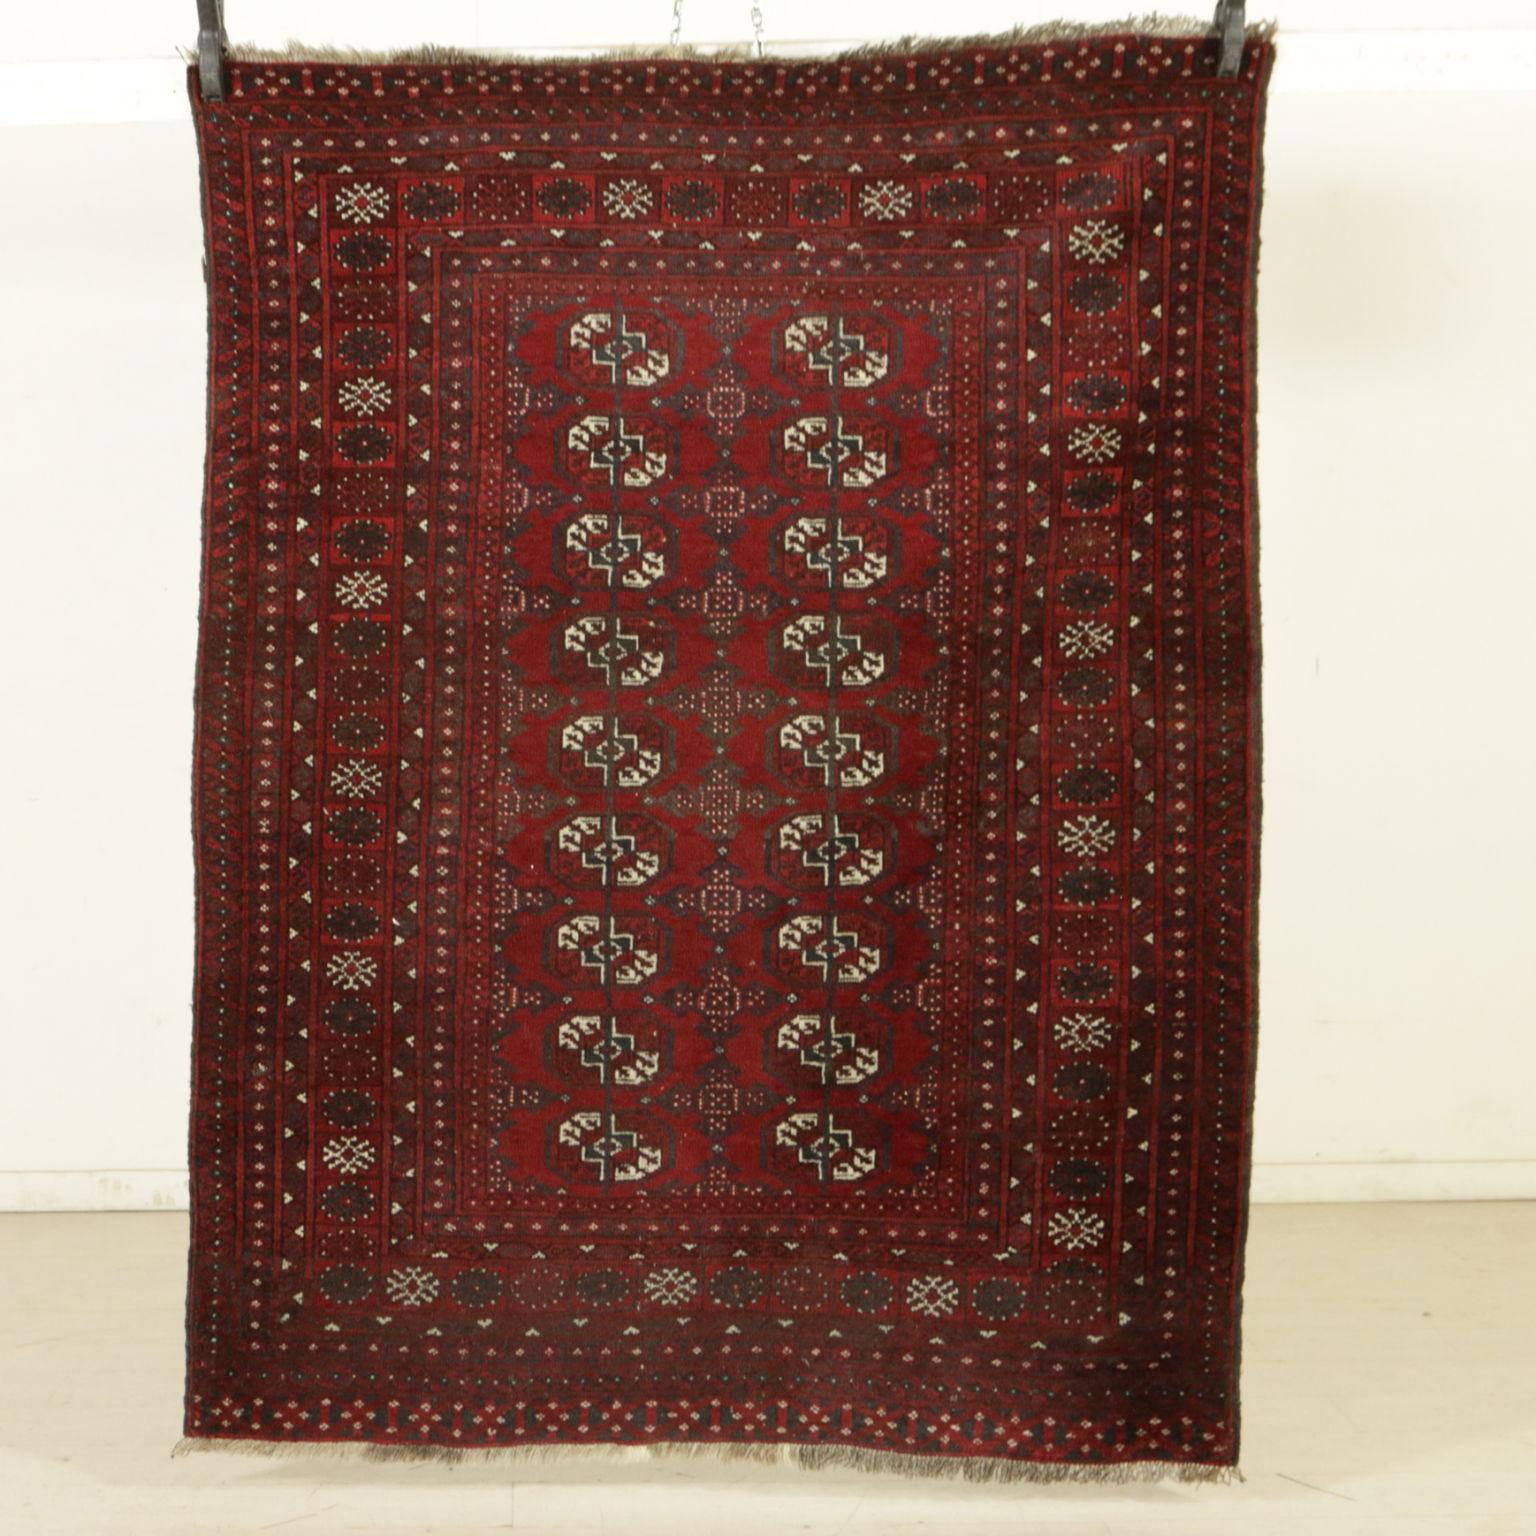 Carpet Bukhara Afghanistan Tappeti Antique